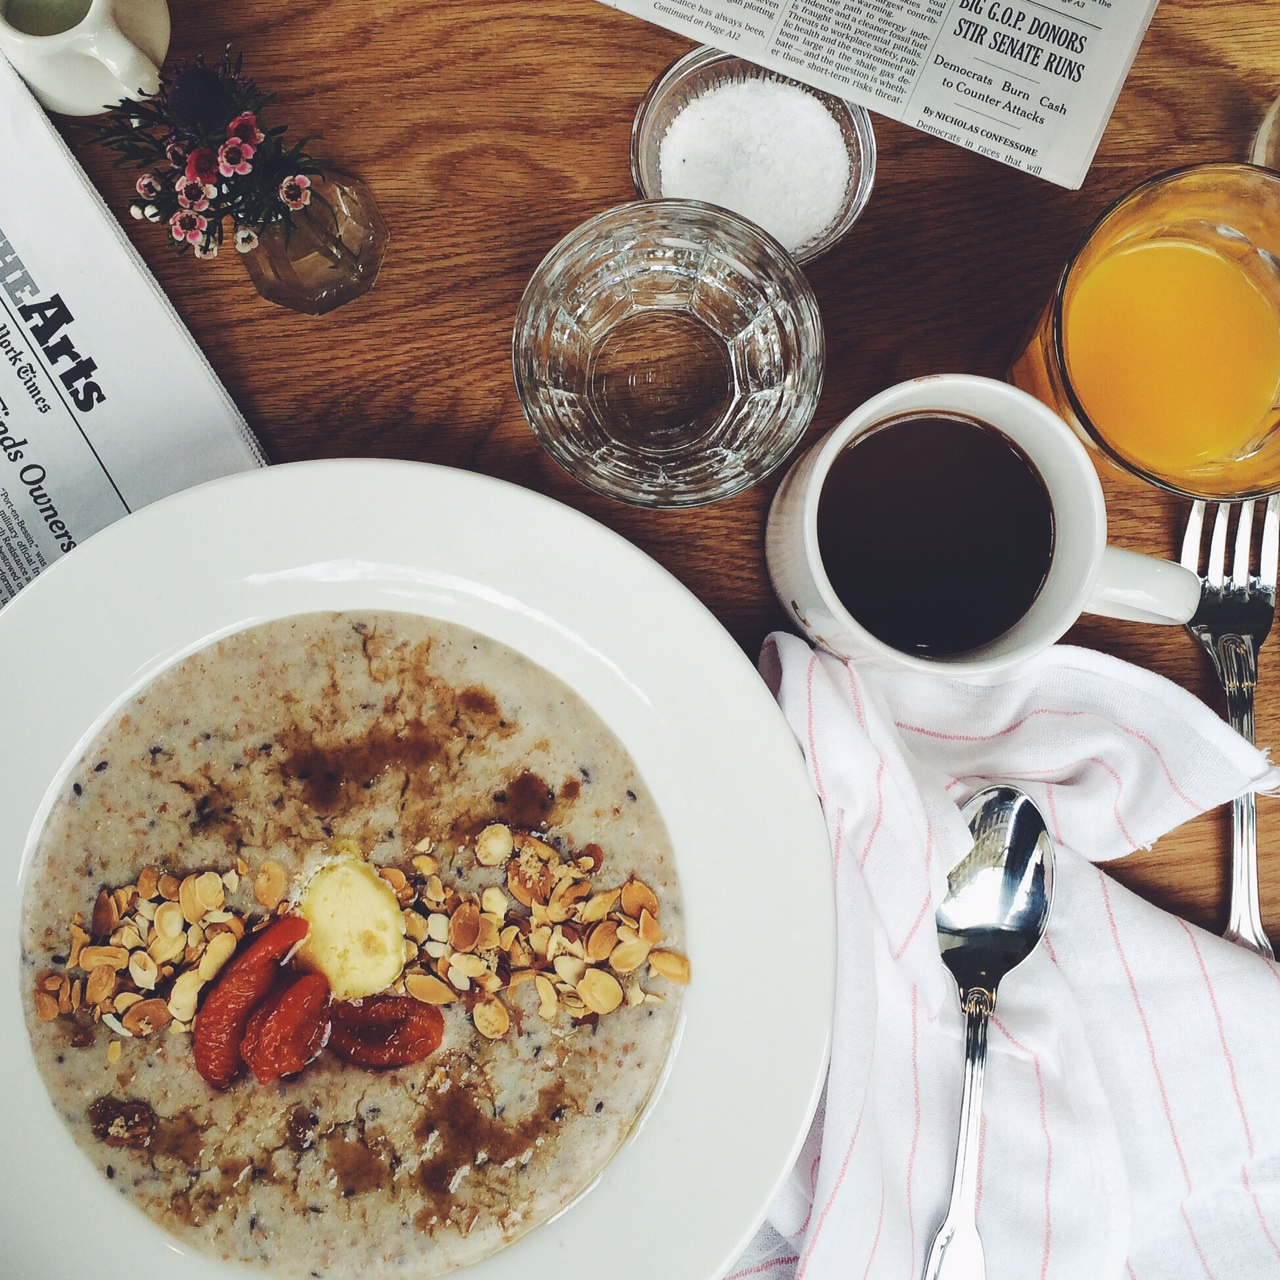 hot cereal breakfast at the London Plane, Seattle - Sandra Harris